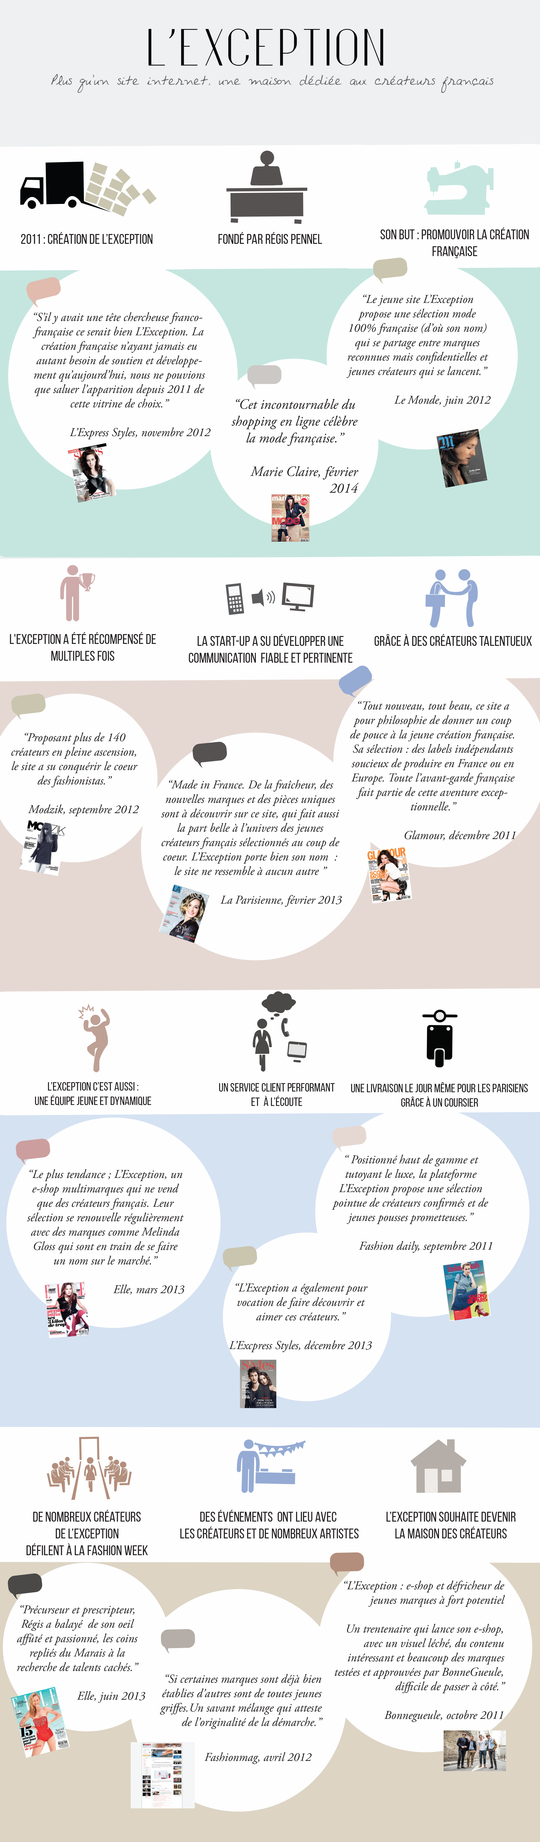 Infographie_modifie_-1414779665